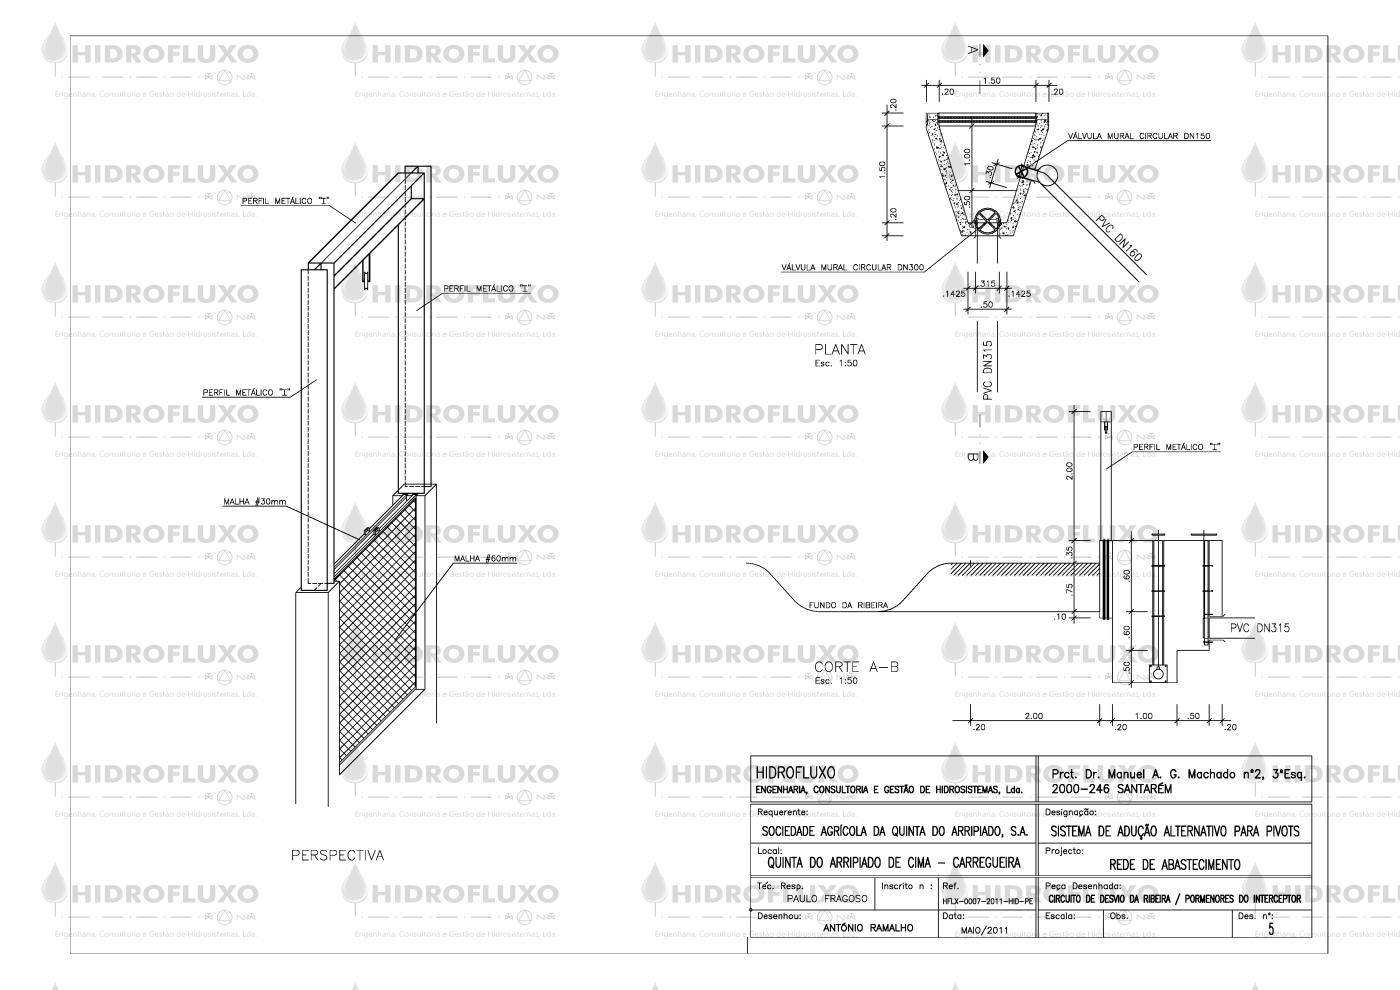 Desenho de Pormenor de Filtro Mural de Deslocamento Vertical